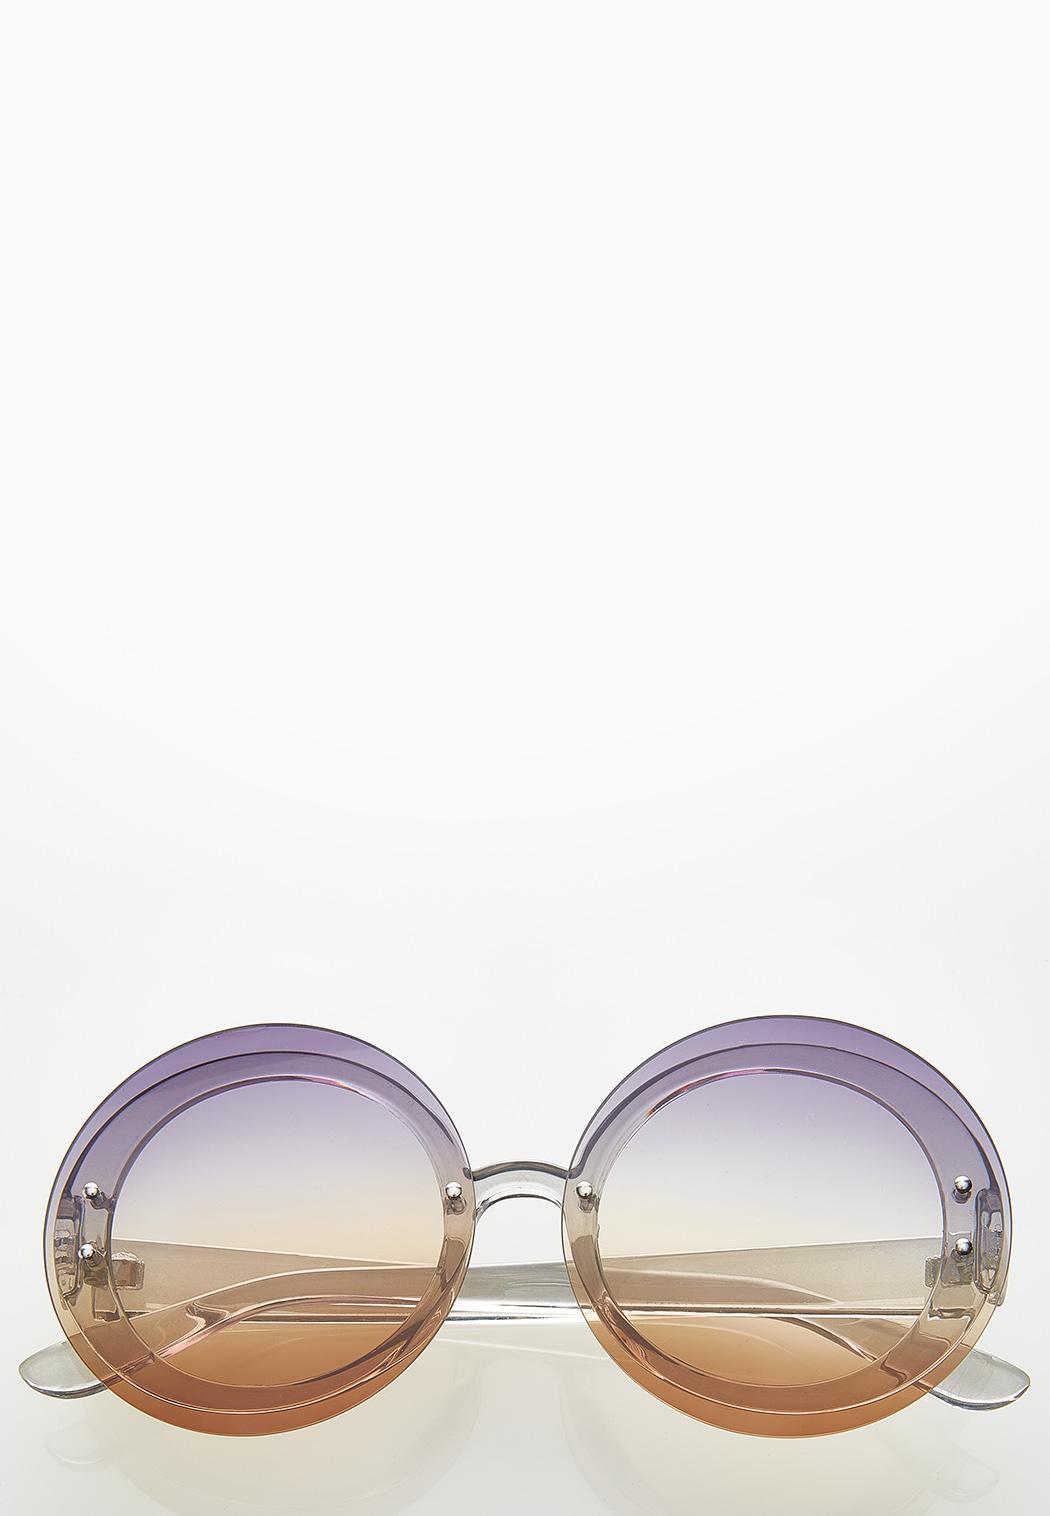 Jenna Ombre Round Sunglasses